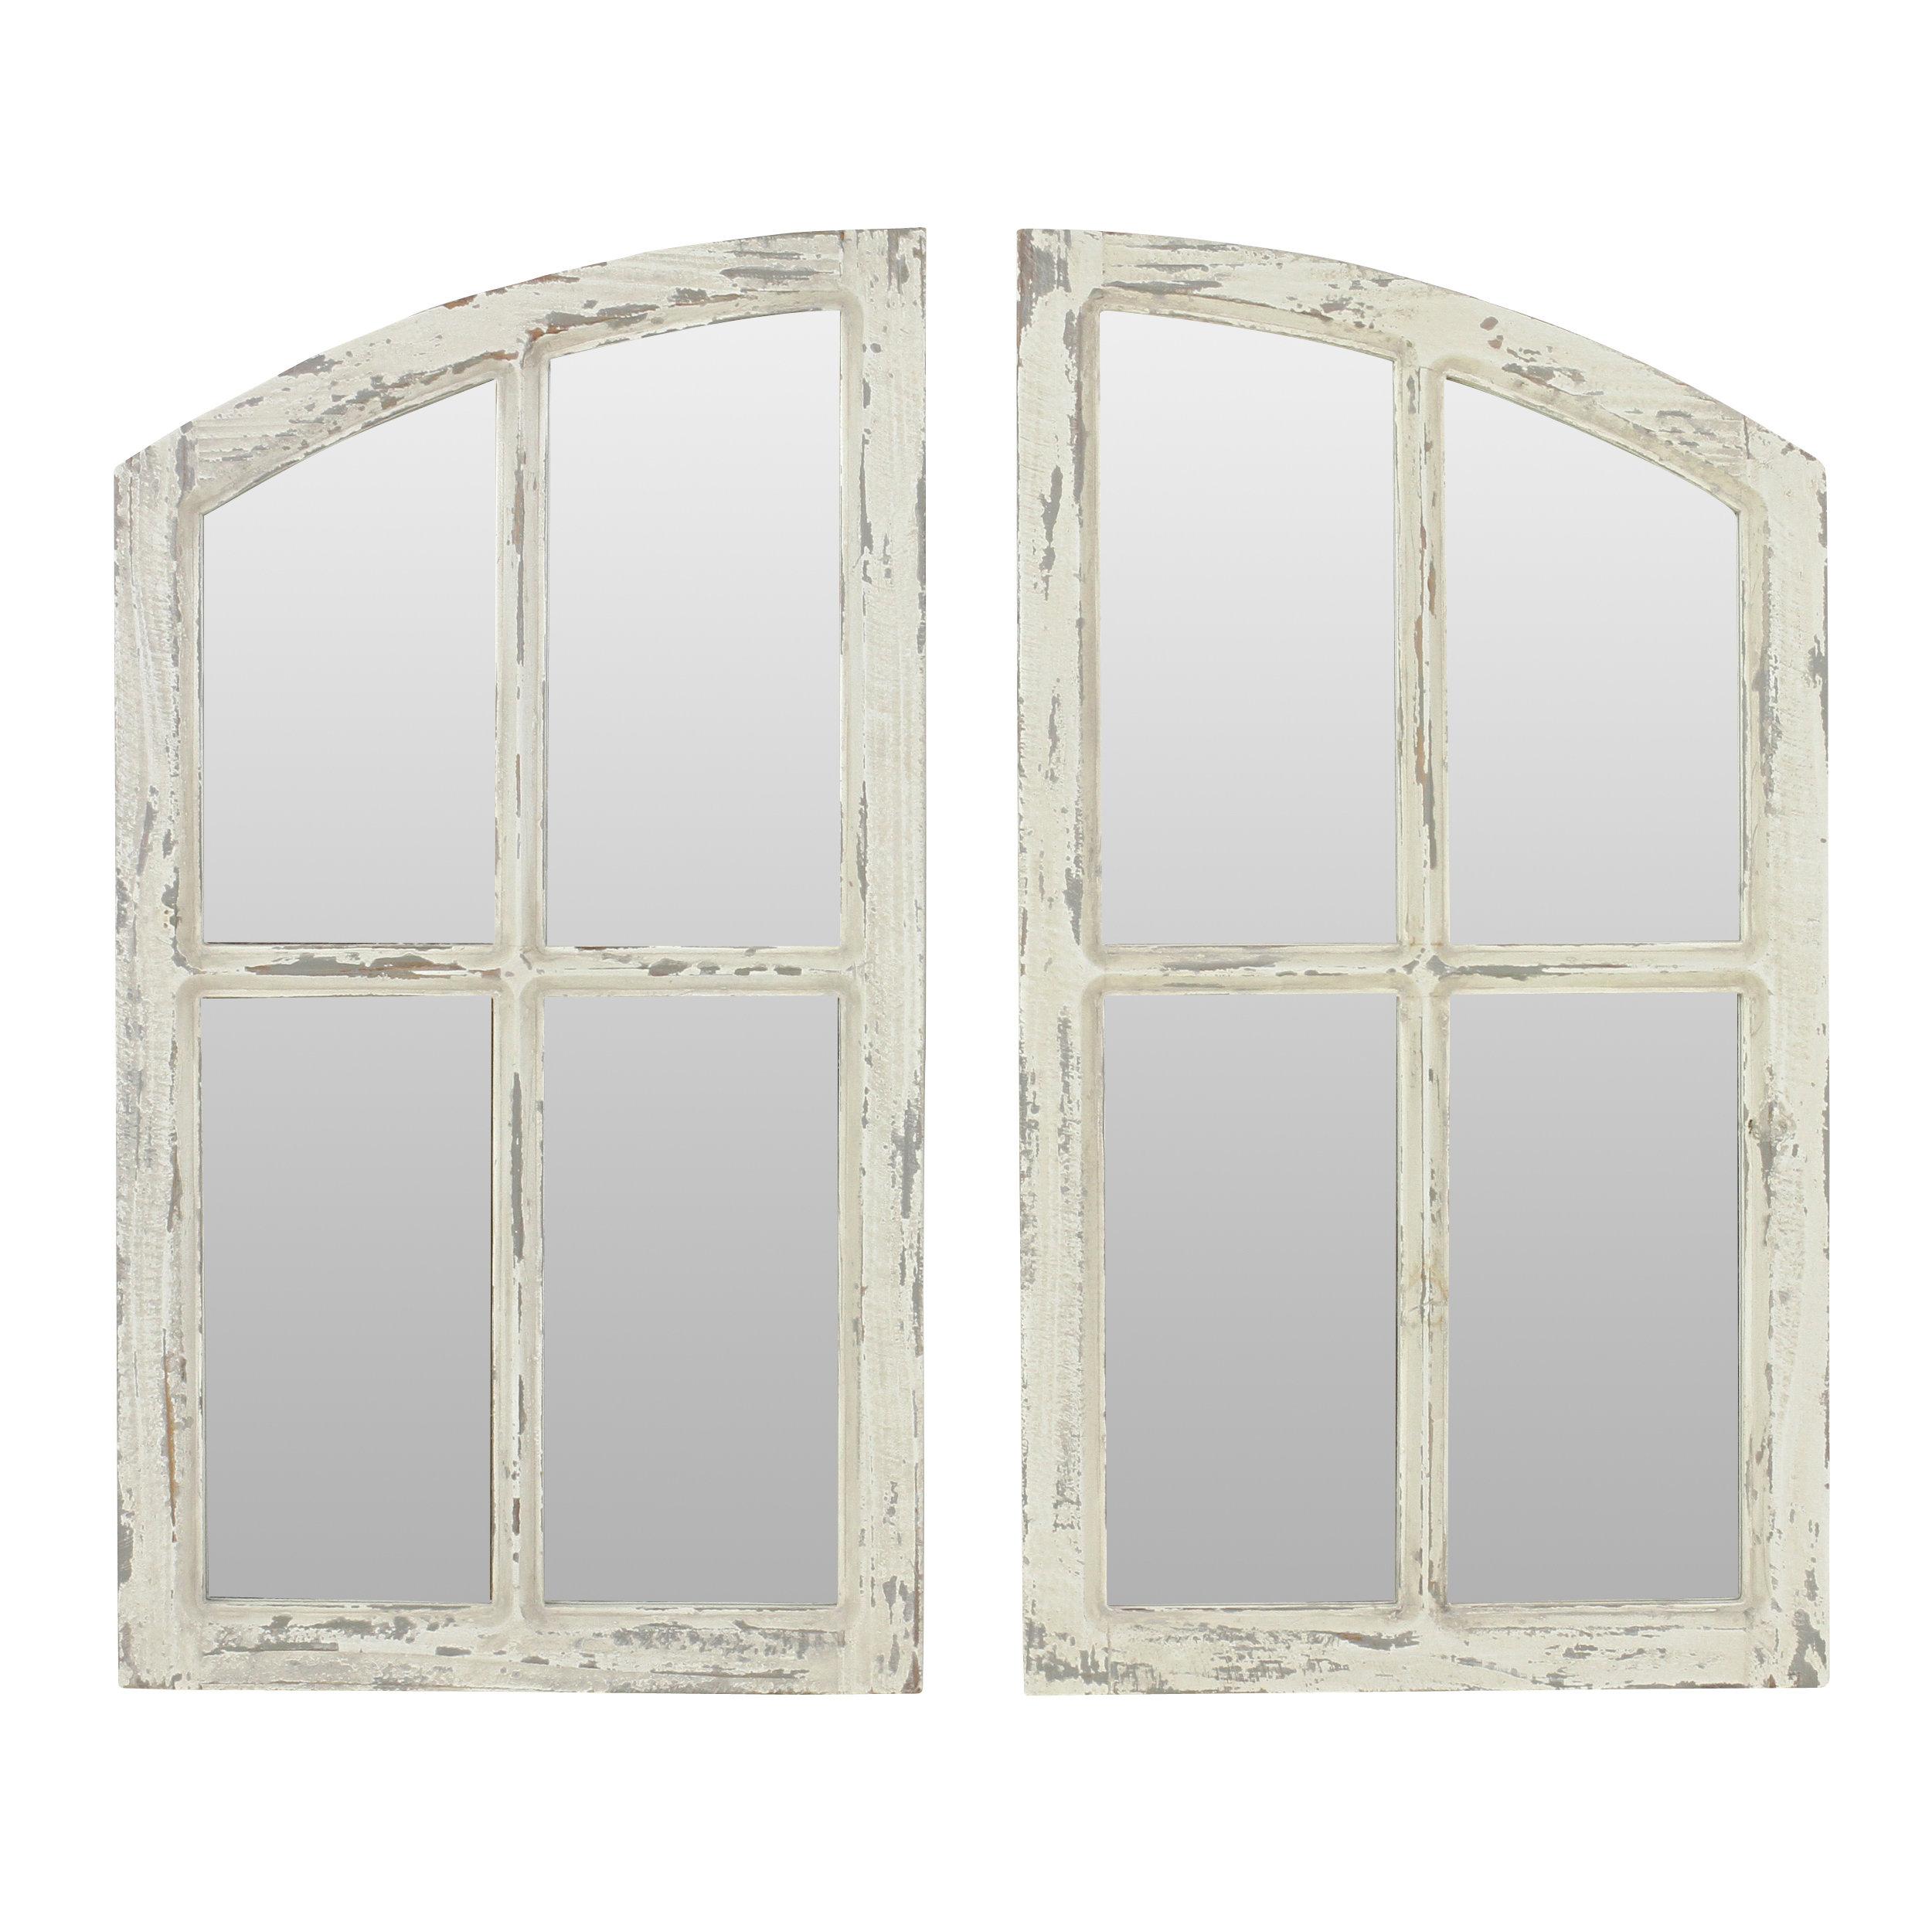 2 Piece Kissena Window Pane Accent Mirror Set Inside 2 Piece Kissena Window Pane Accent Mirror Sets (View 3 of 20)